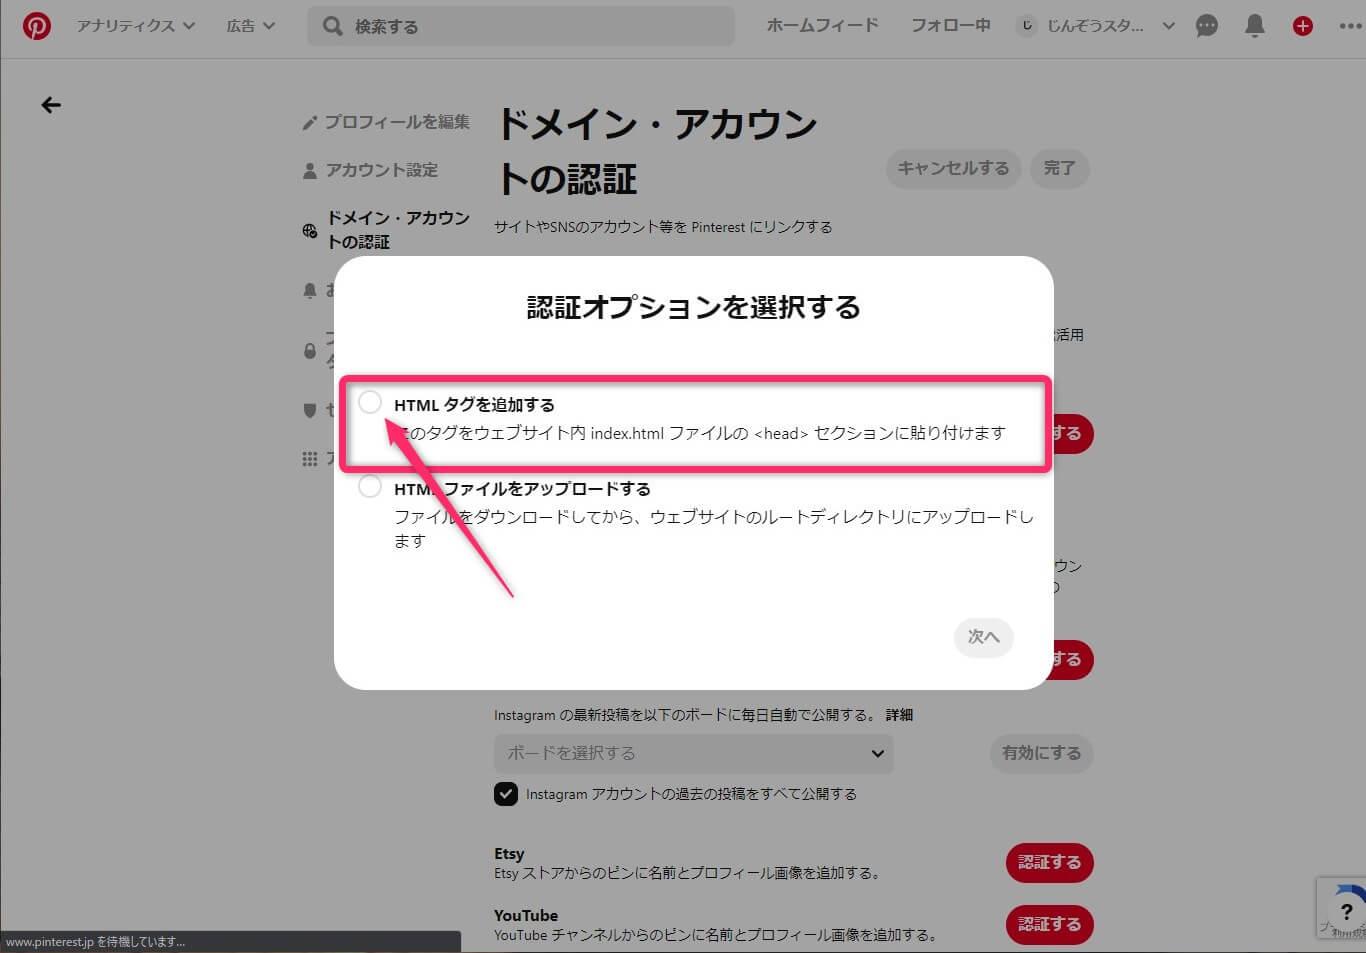 Pinterest(ピンタレスト)のサイト認証画面